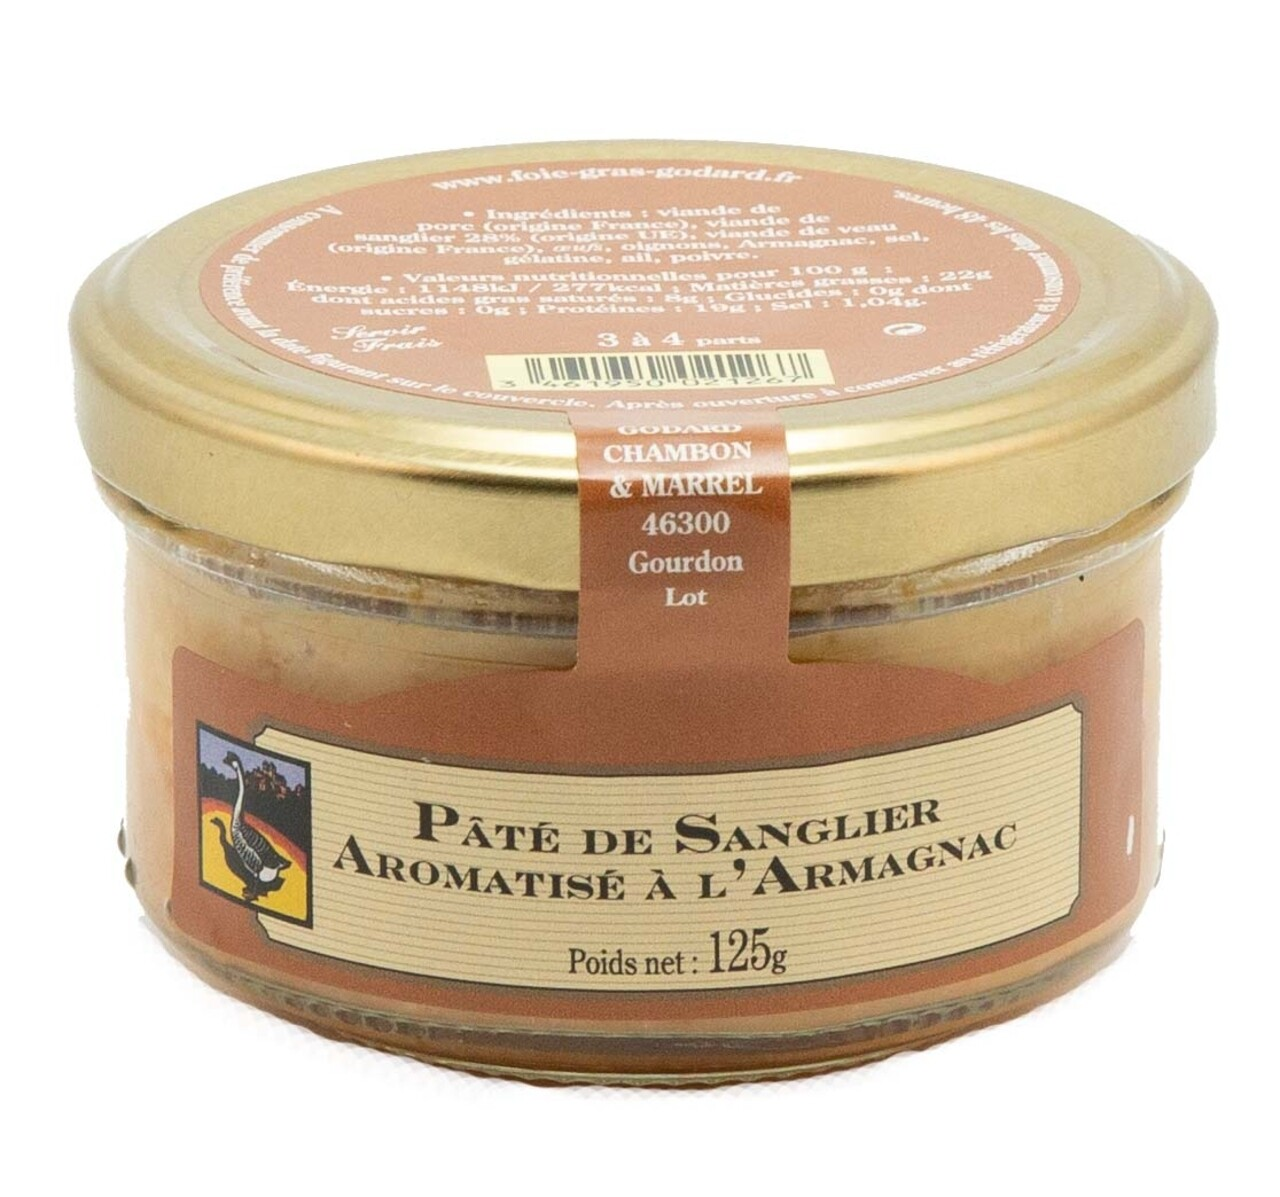 Pate de mistret cu Armagnac, Godard Chambon & Marell, 125g